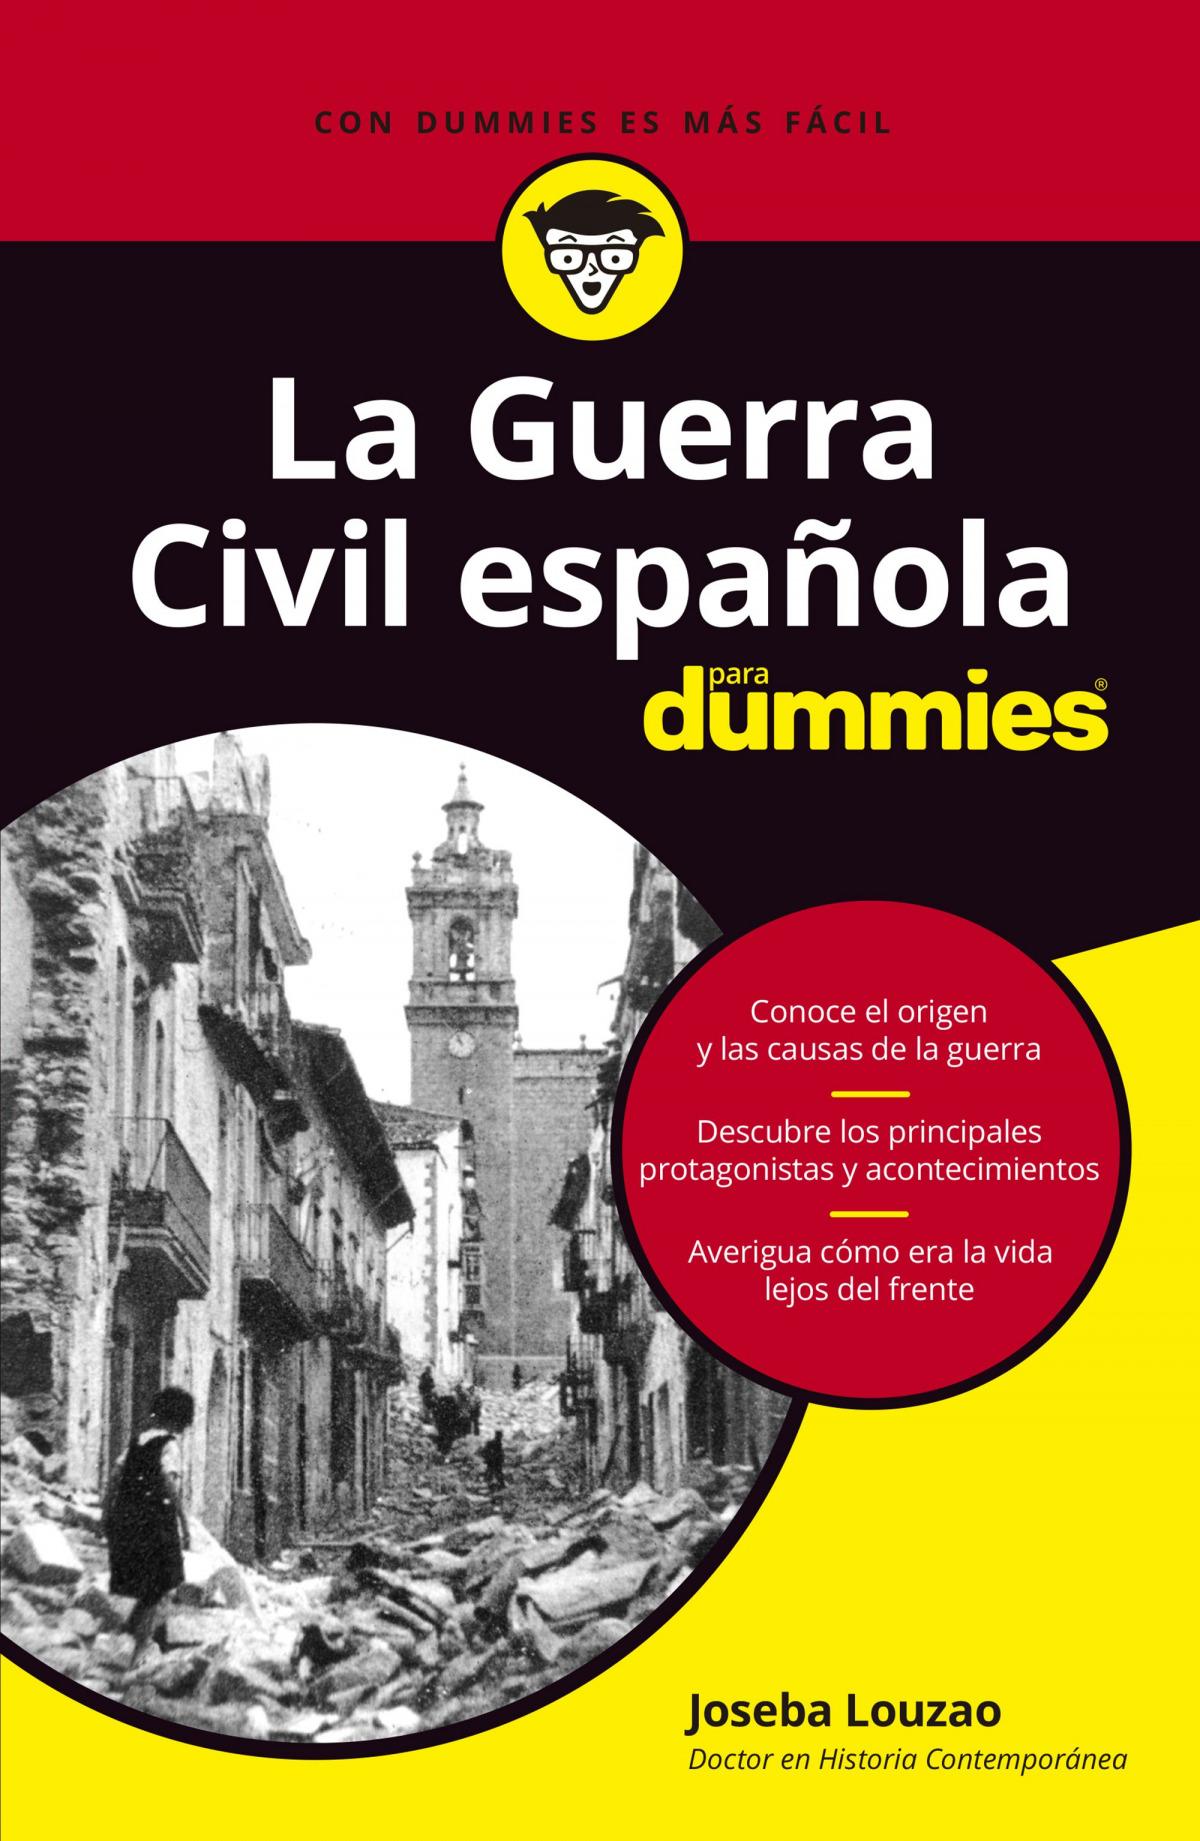 La Guerra Civil española para dummies